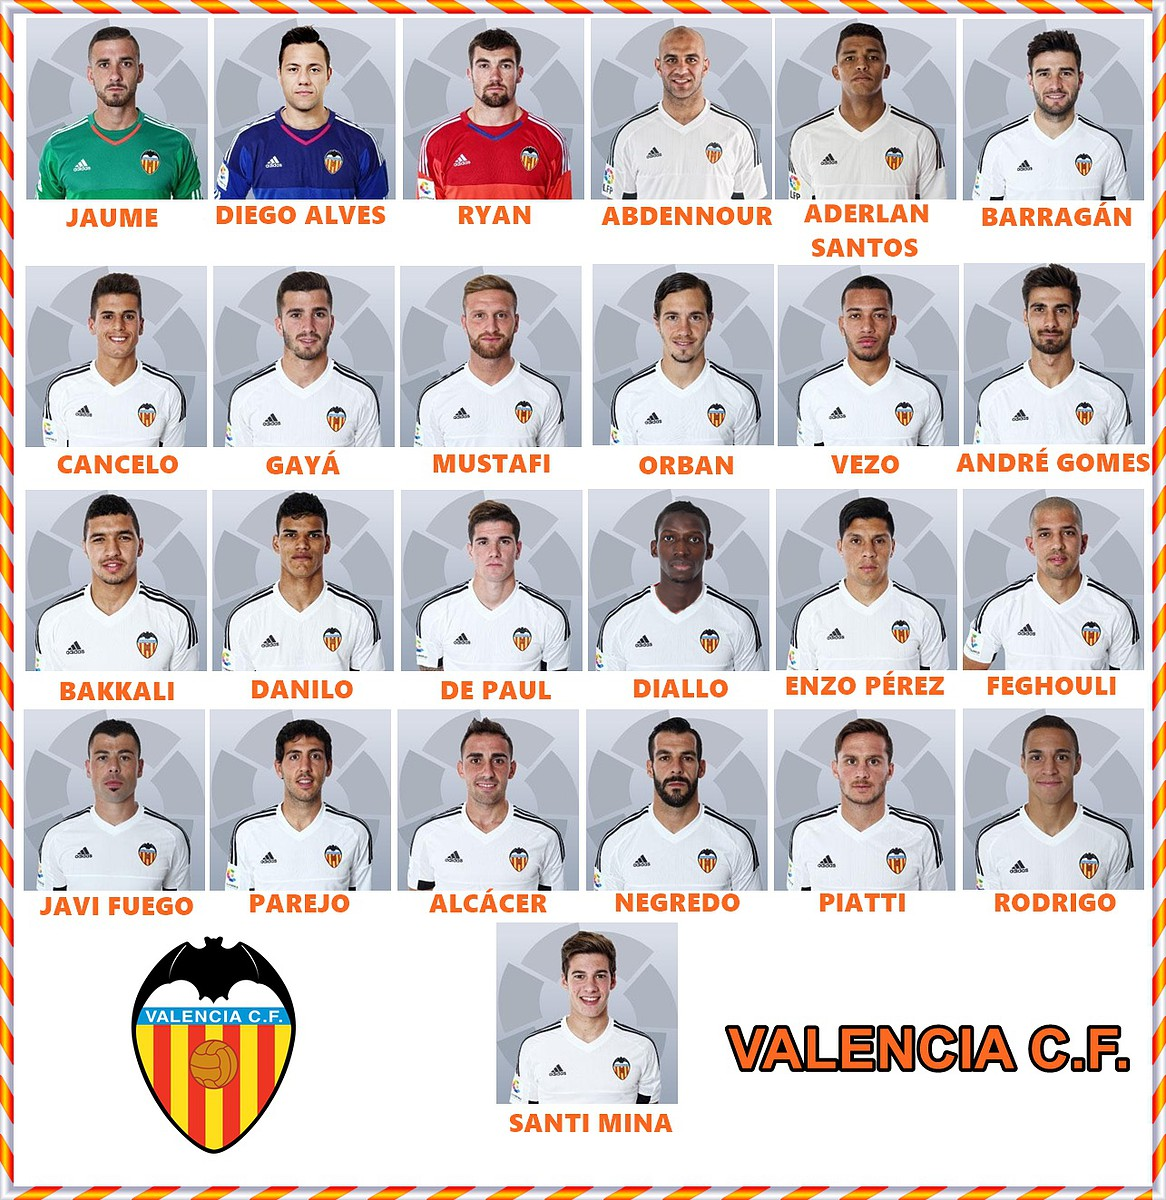 Hilo del Valencia C.F 28a32a5443b6d1da0c18a46416a8867bo